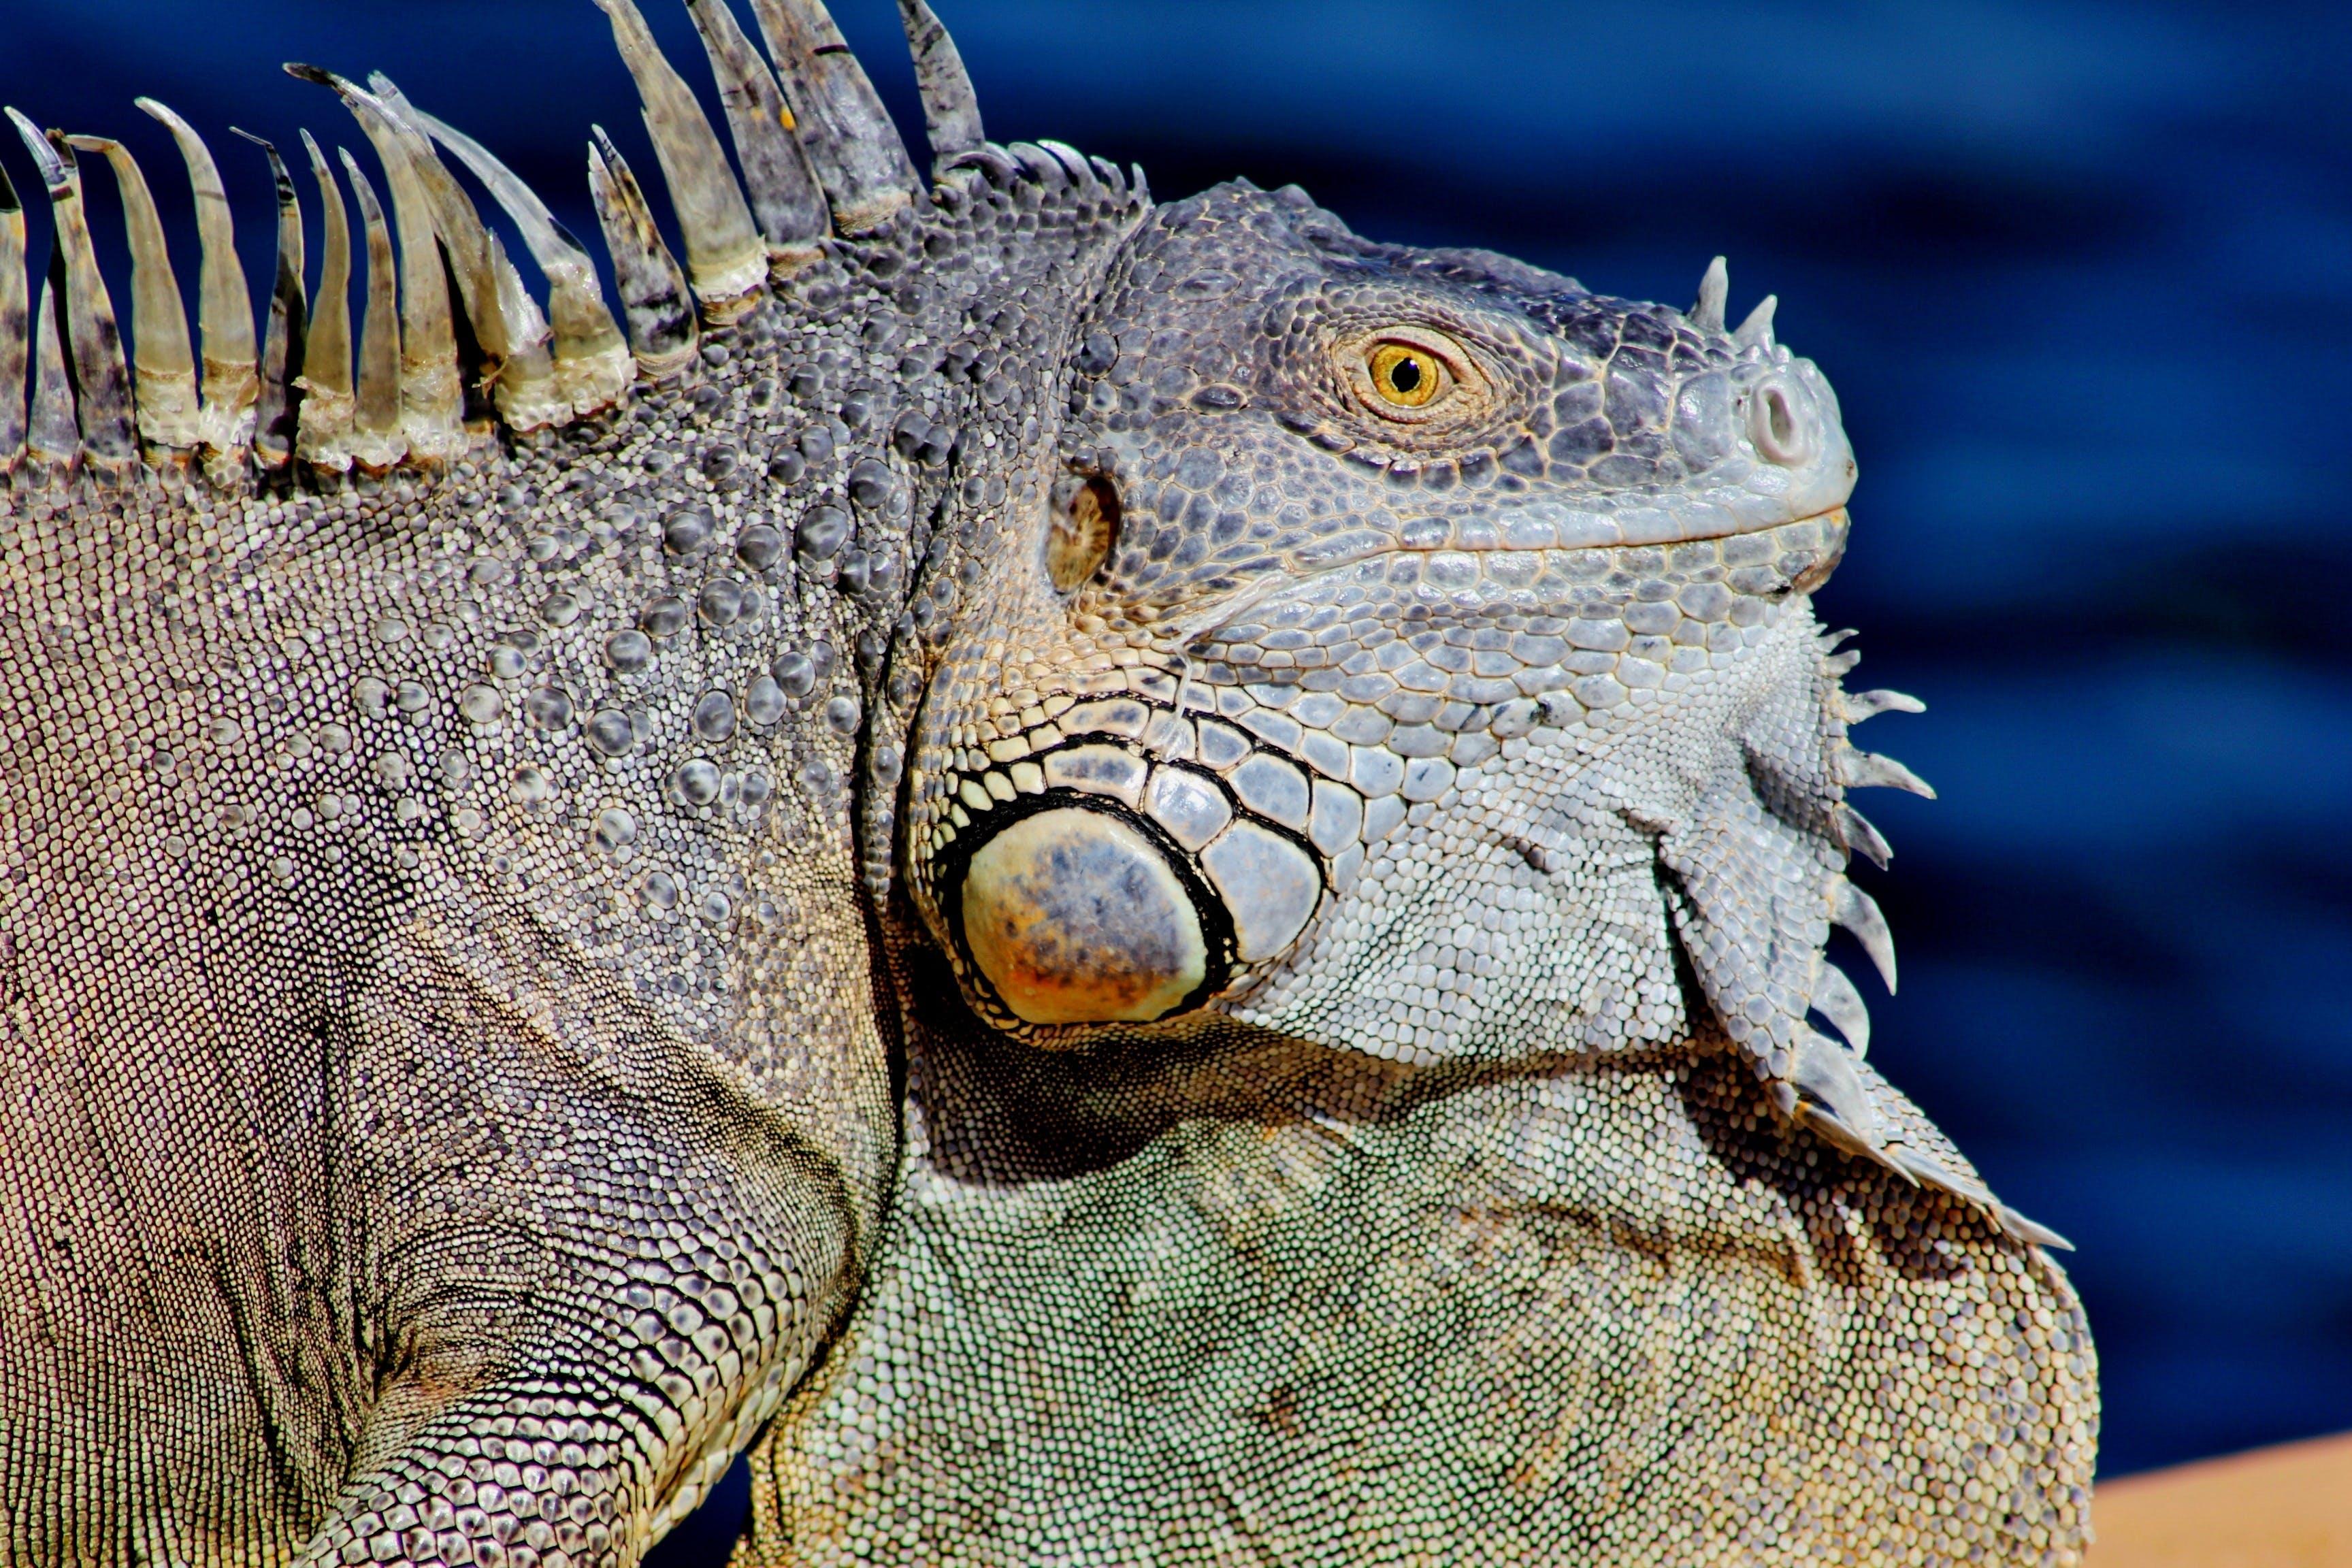 Gray and Green Iguana Close-up Photography